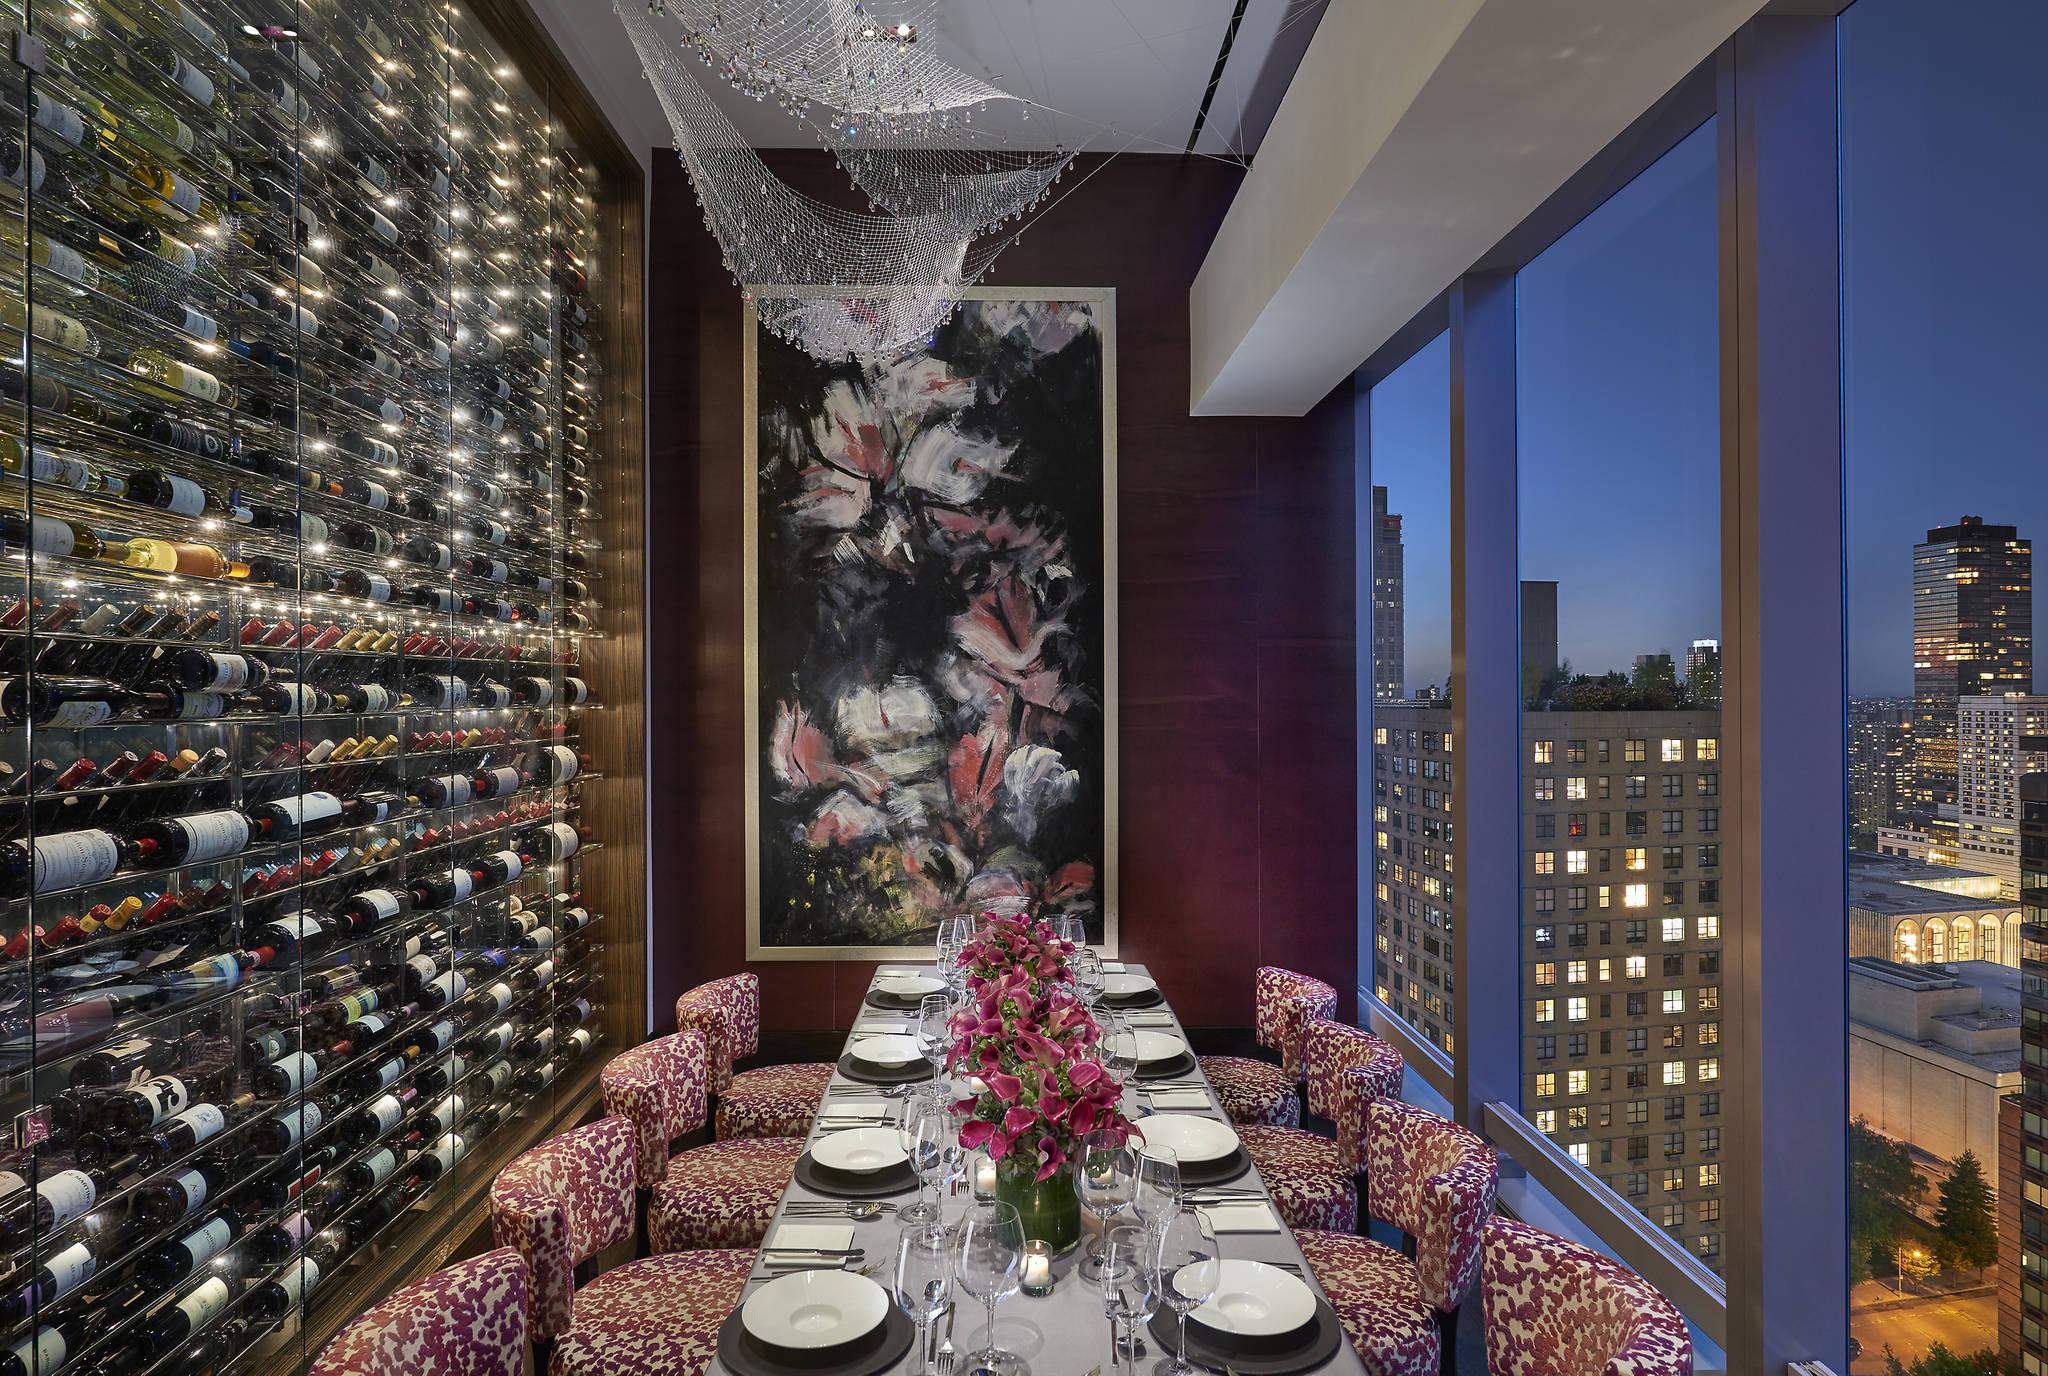 mandarin hotel new york fine dining asiate restaurant